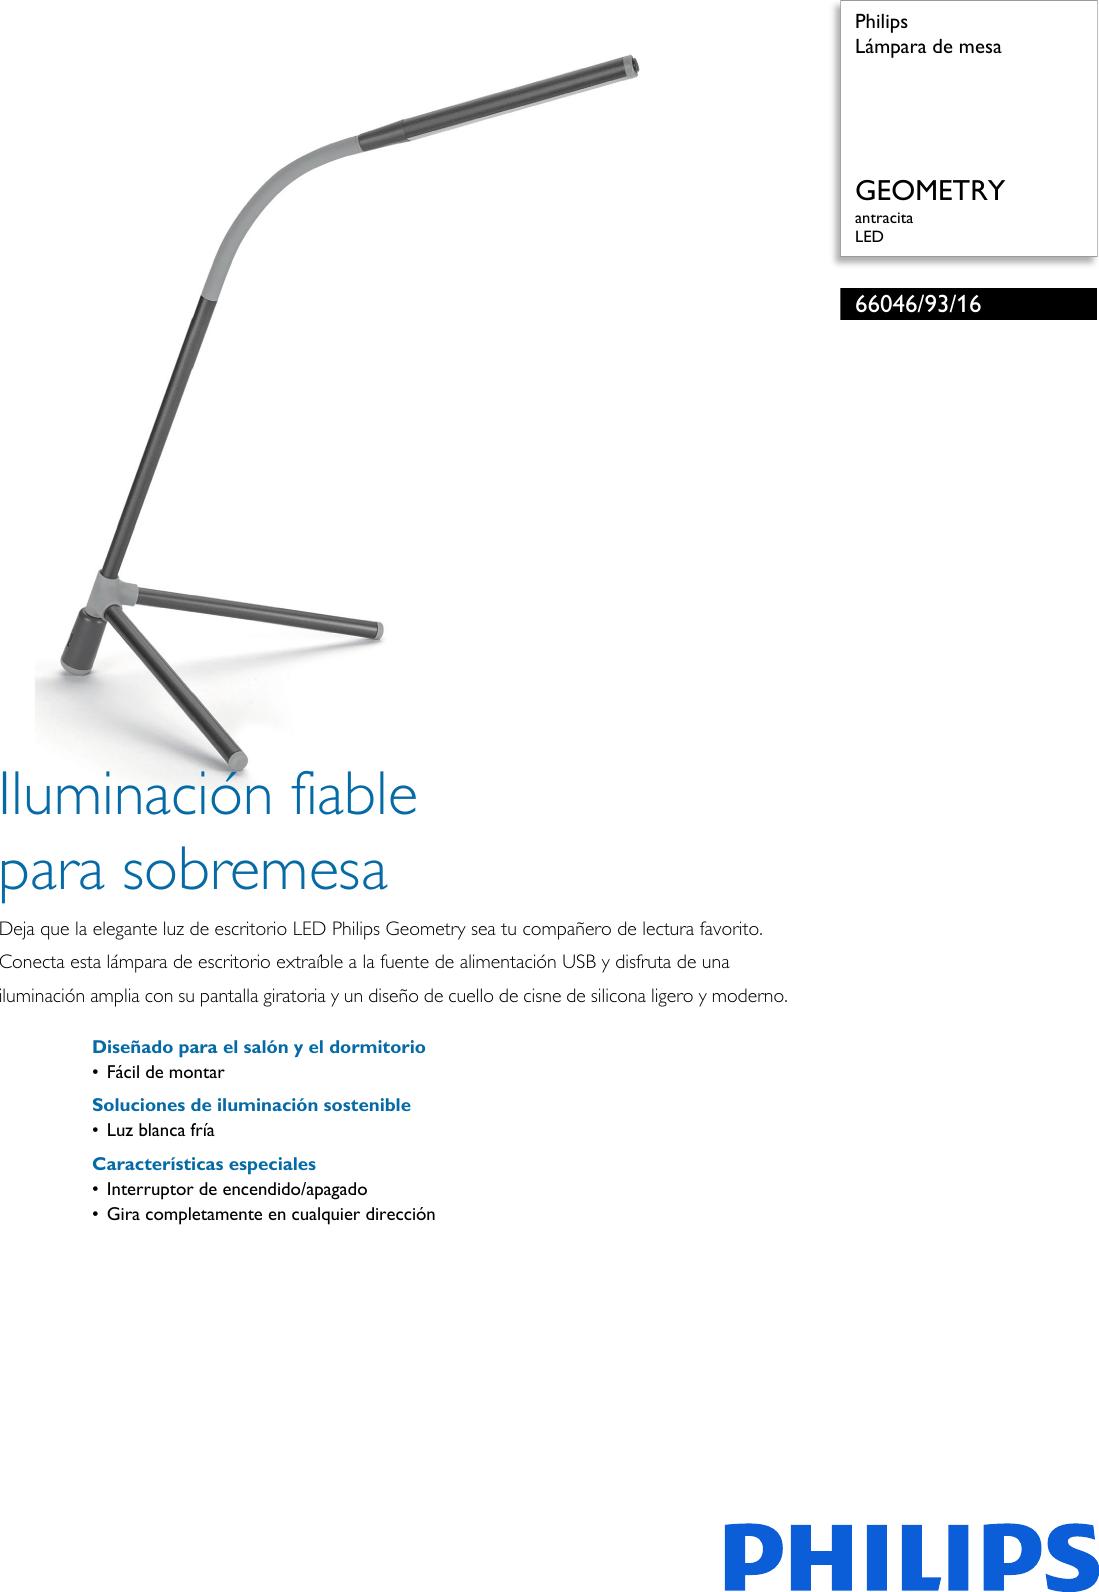 Philips 66046/93/16 660469316 Lámpara De Mesa User Manual